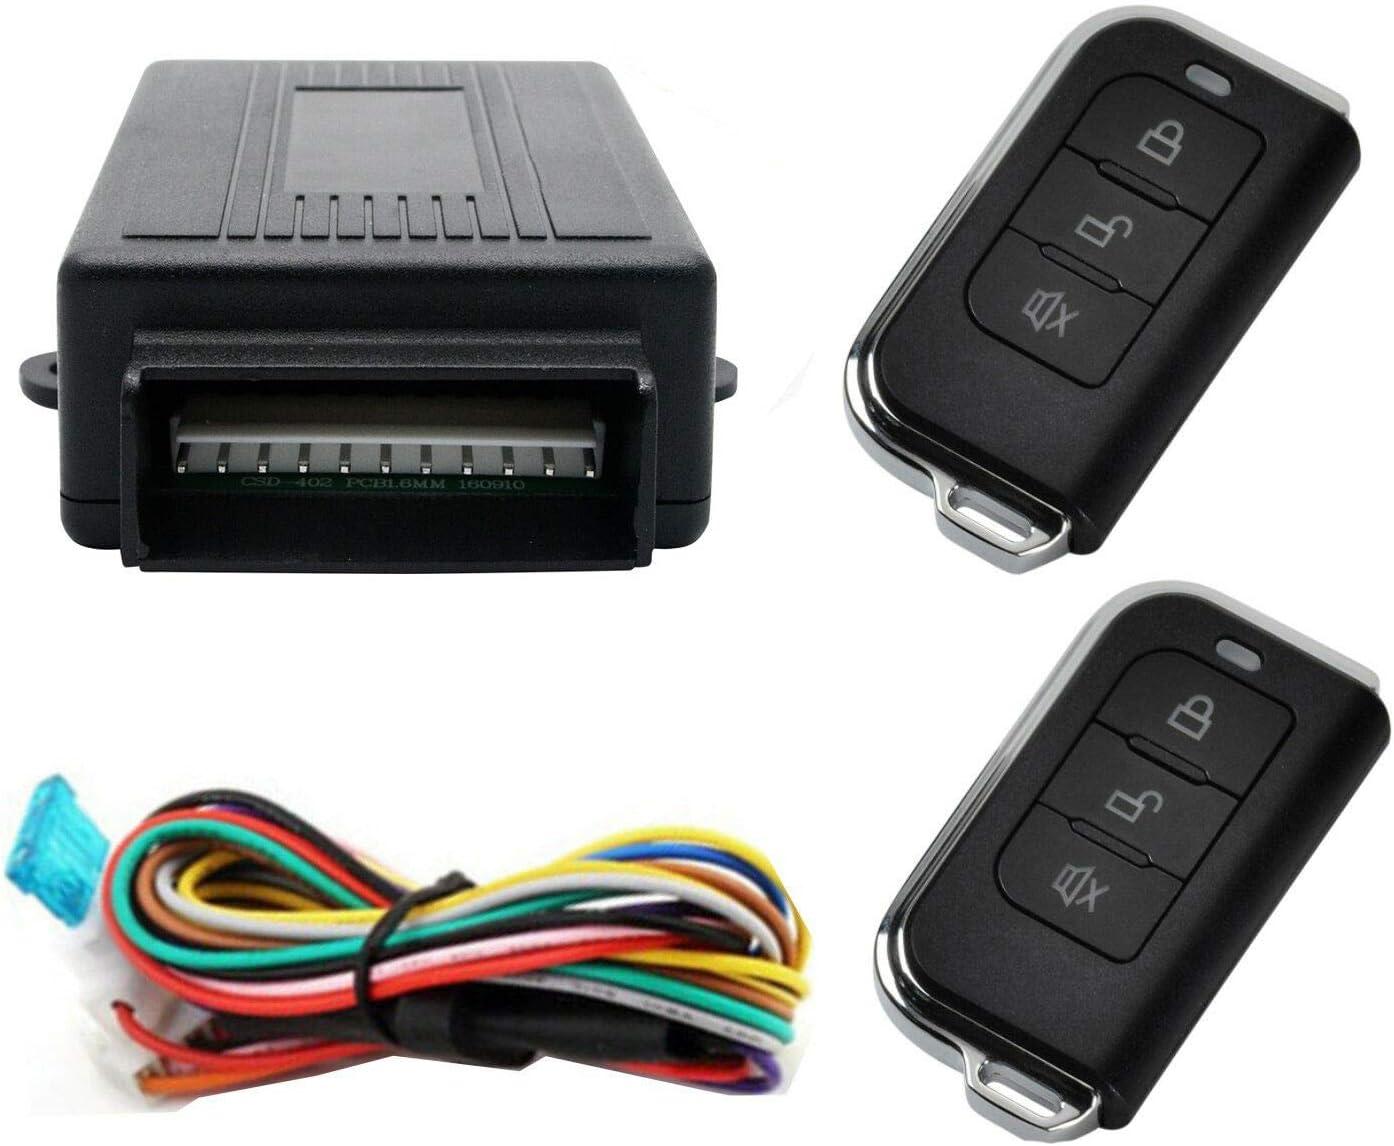 Bessie Sparks Car Remote Control Central Locking Kit Universal Keyless Entry System 2 keys